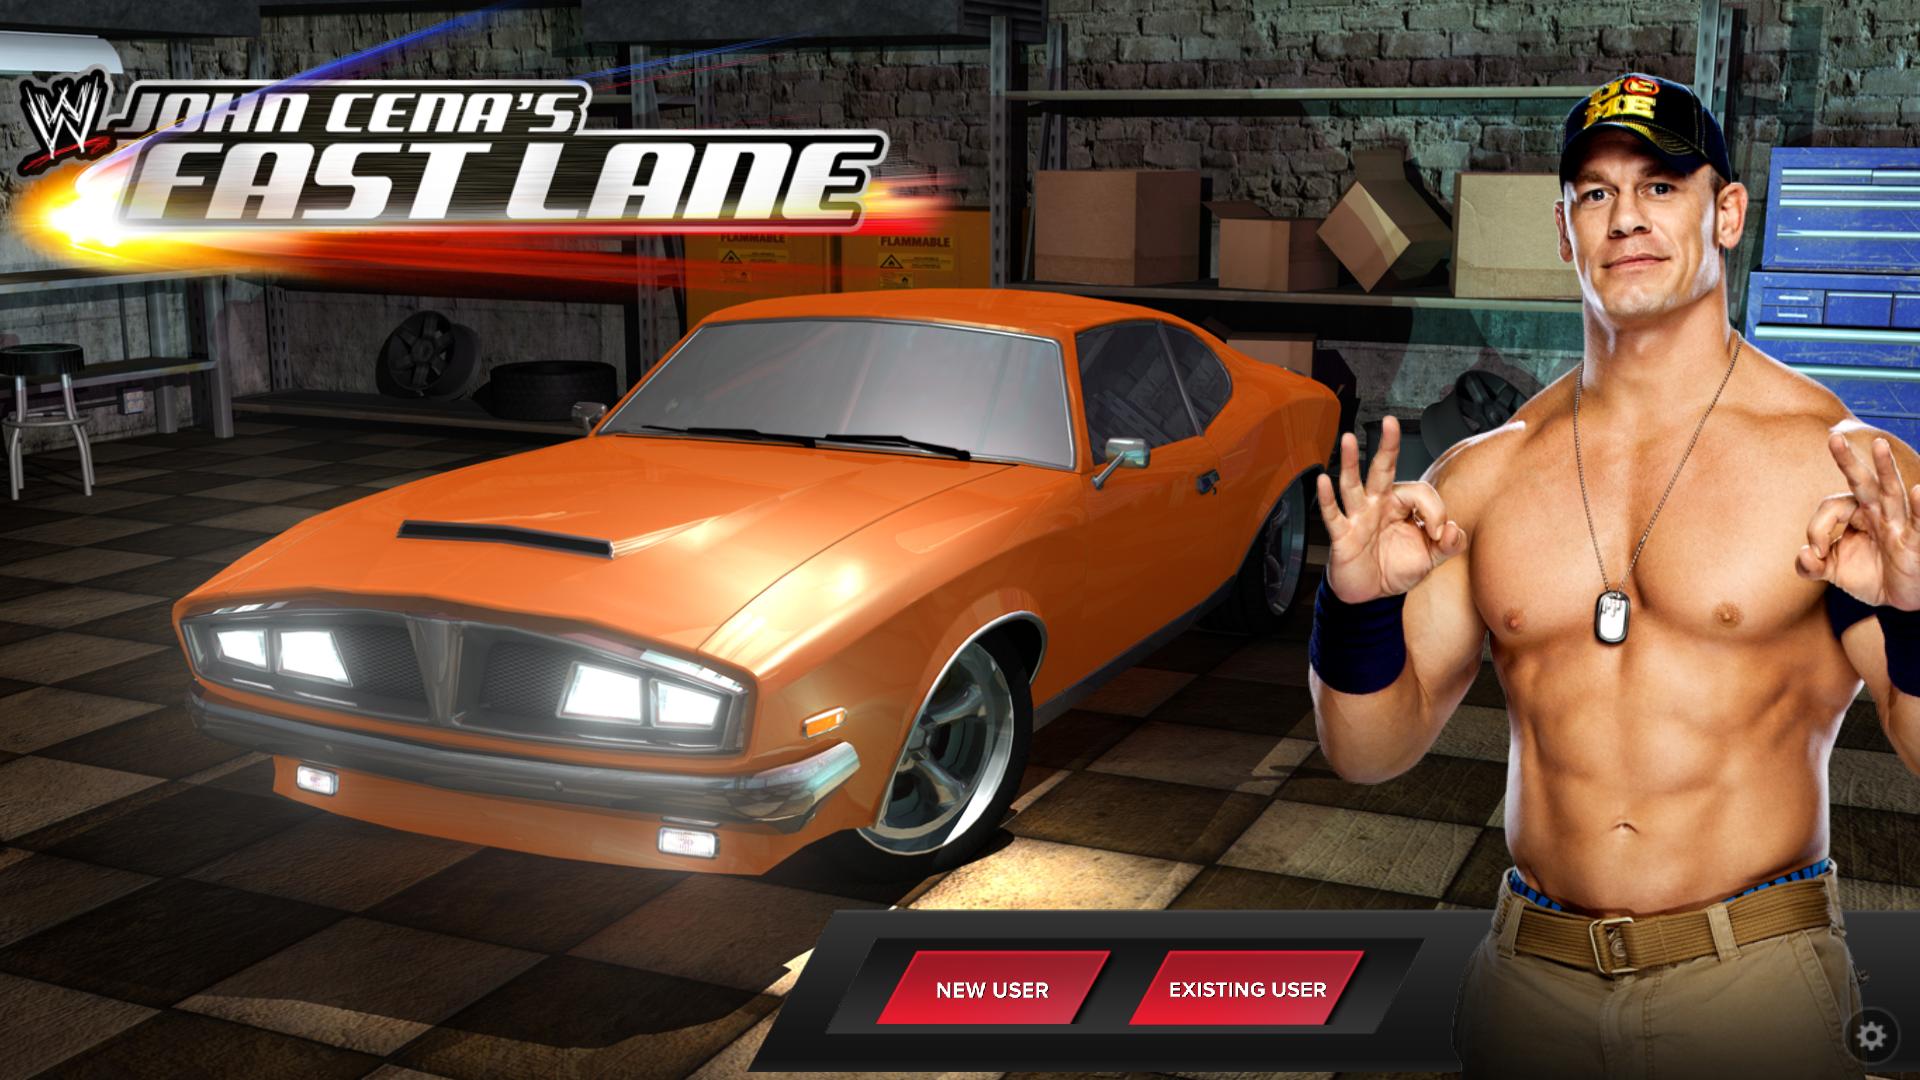 Wwe John Cena S Fast Lane Google Play Store Revenue Download